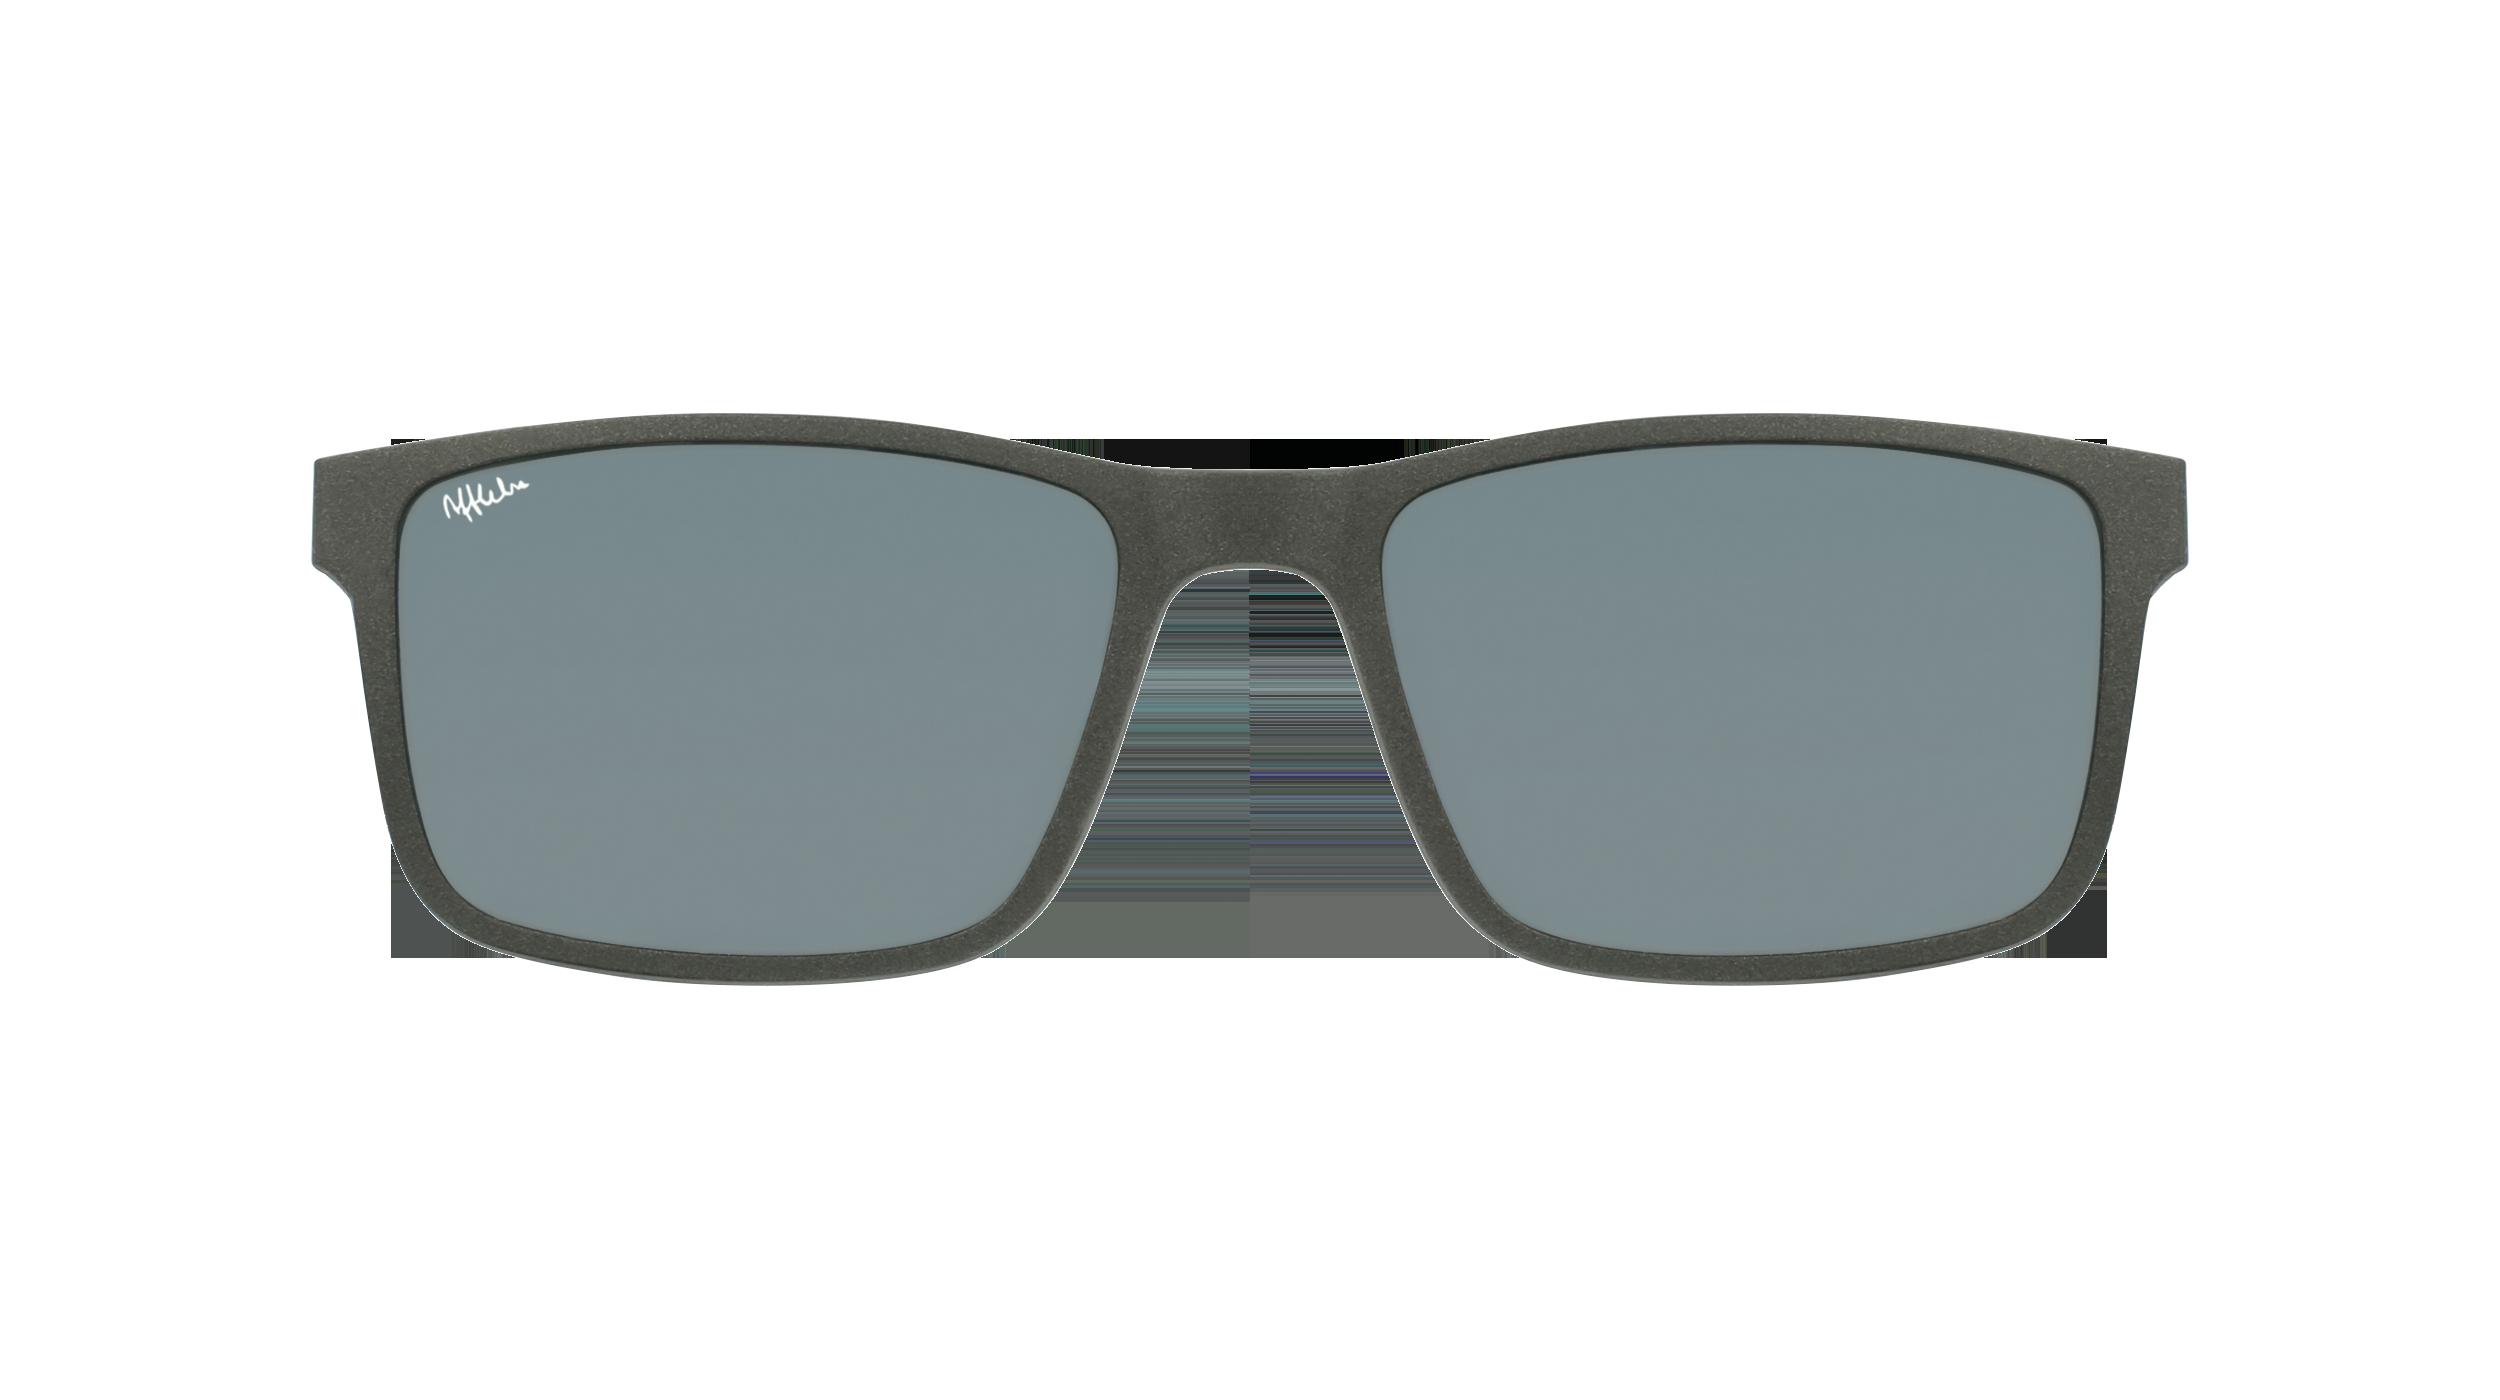 afflelou/france/products/smart_clip/clips_glasses/07630036457429.png